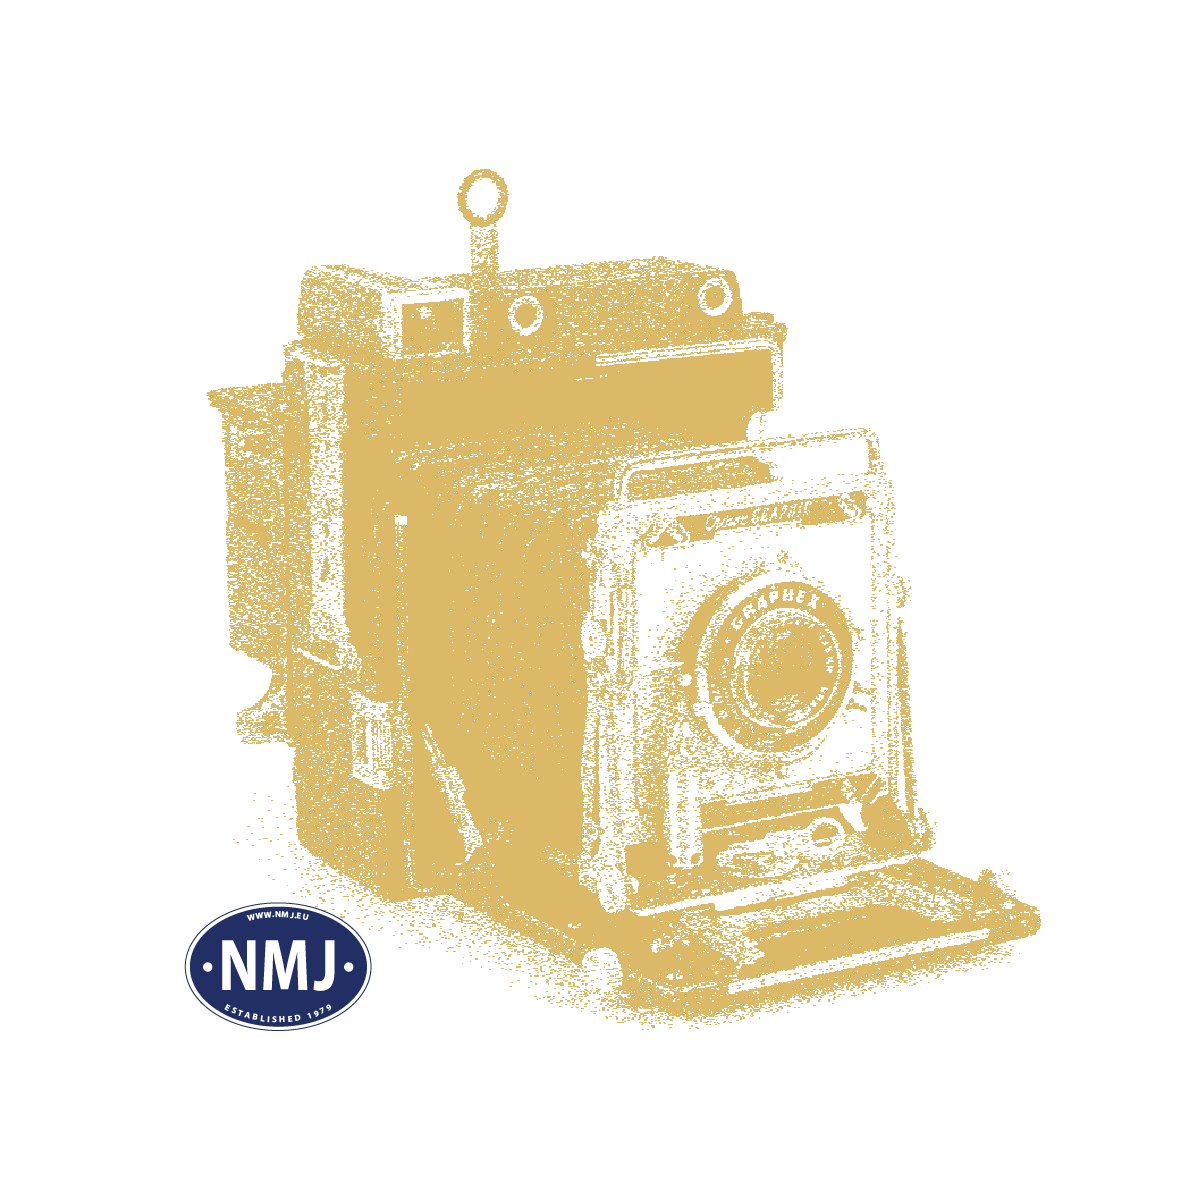 NMJ0G4-4 - NMJ Superline NSB Gbkls 20 76 158 5809-3, 0-Scala